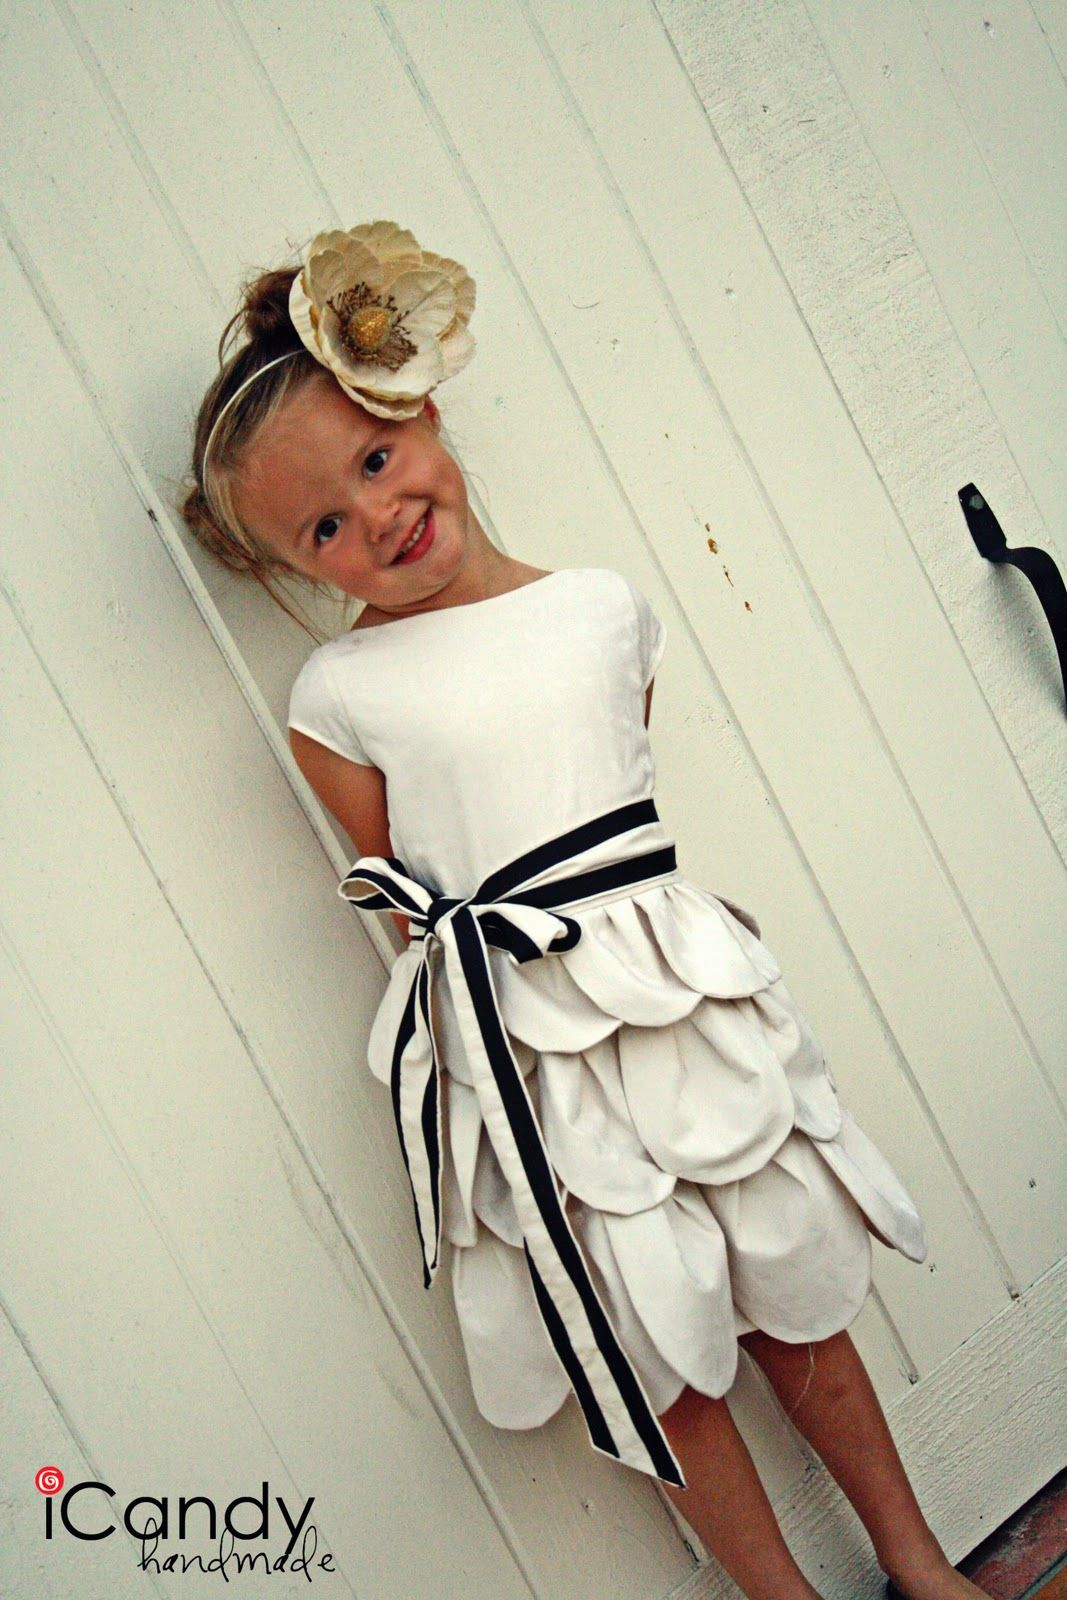 icandy handmade: (tutorial) Petal Dress